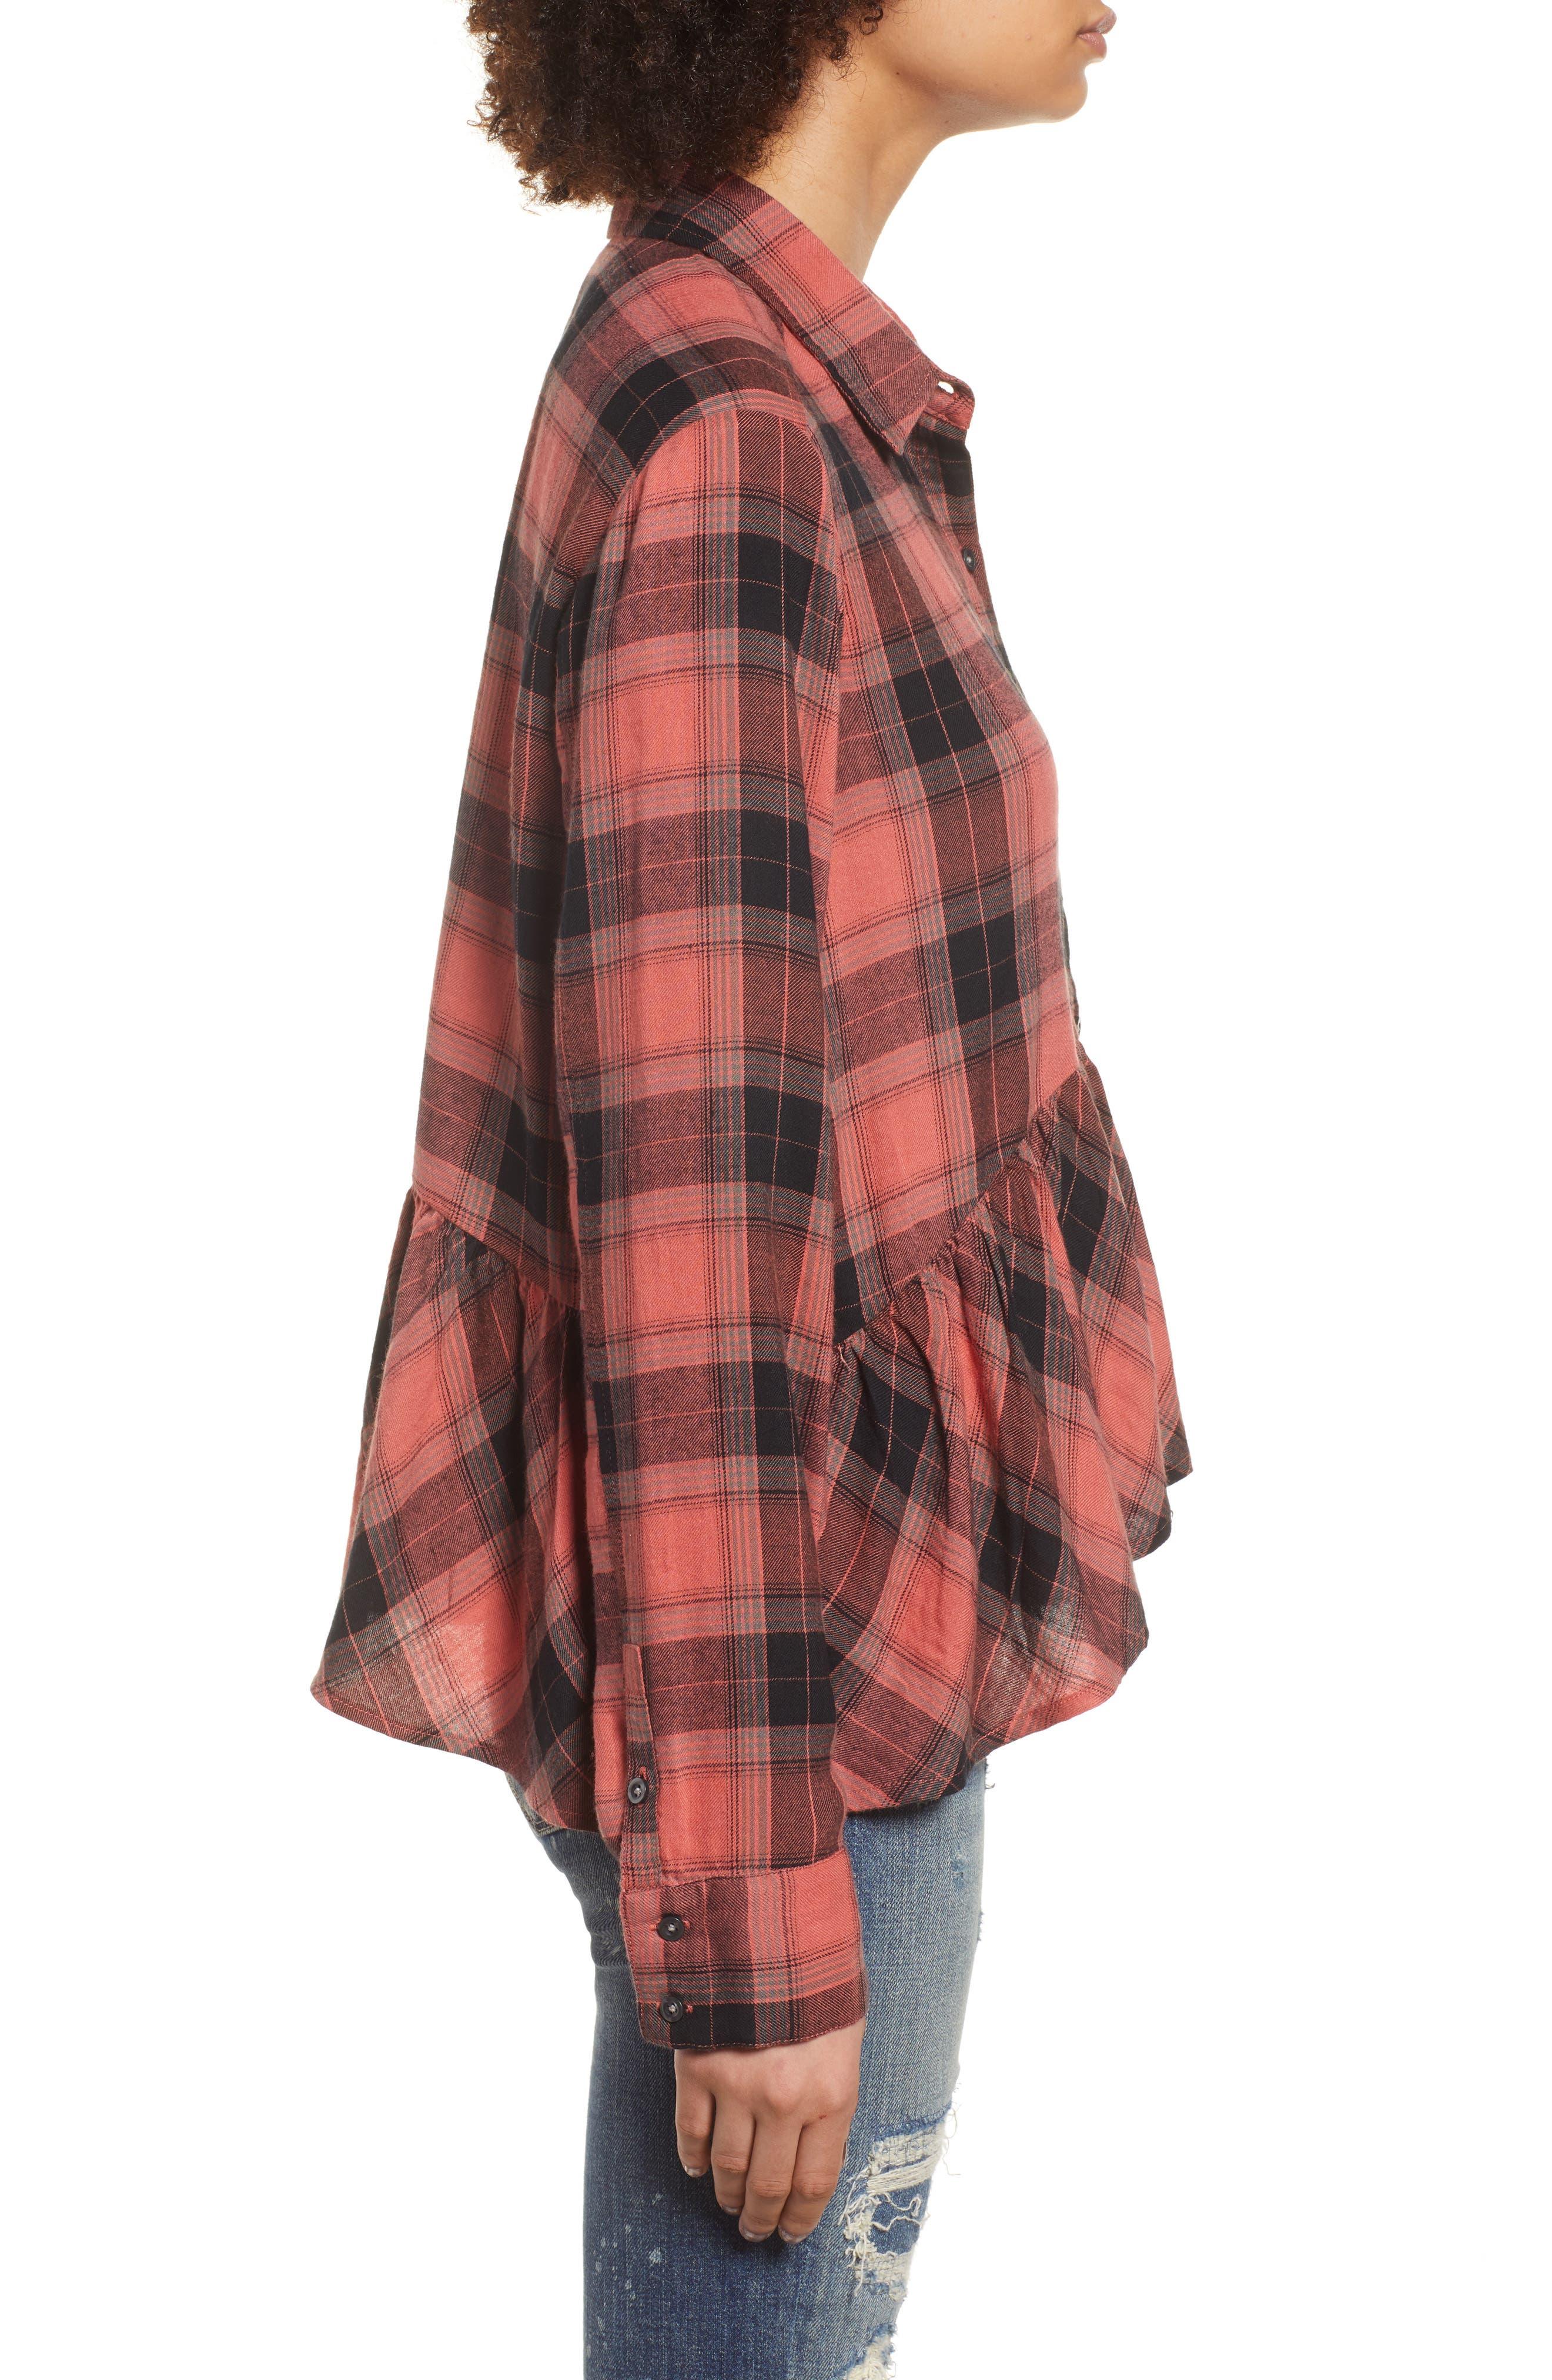 Plaid Peplum Shirt,                             Alternate thumbnail 3, color,                             PINK CEDAR SKETCHY PLAID